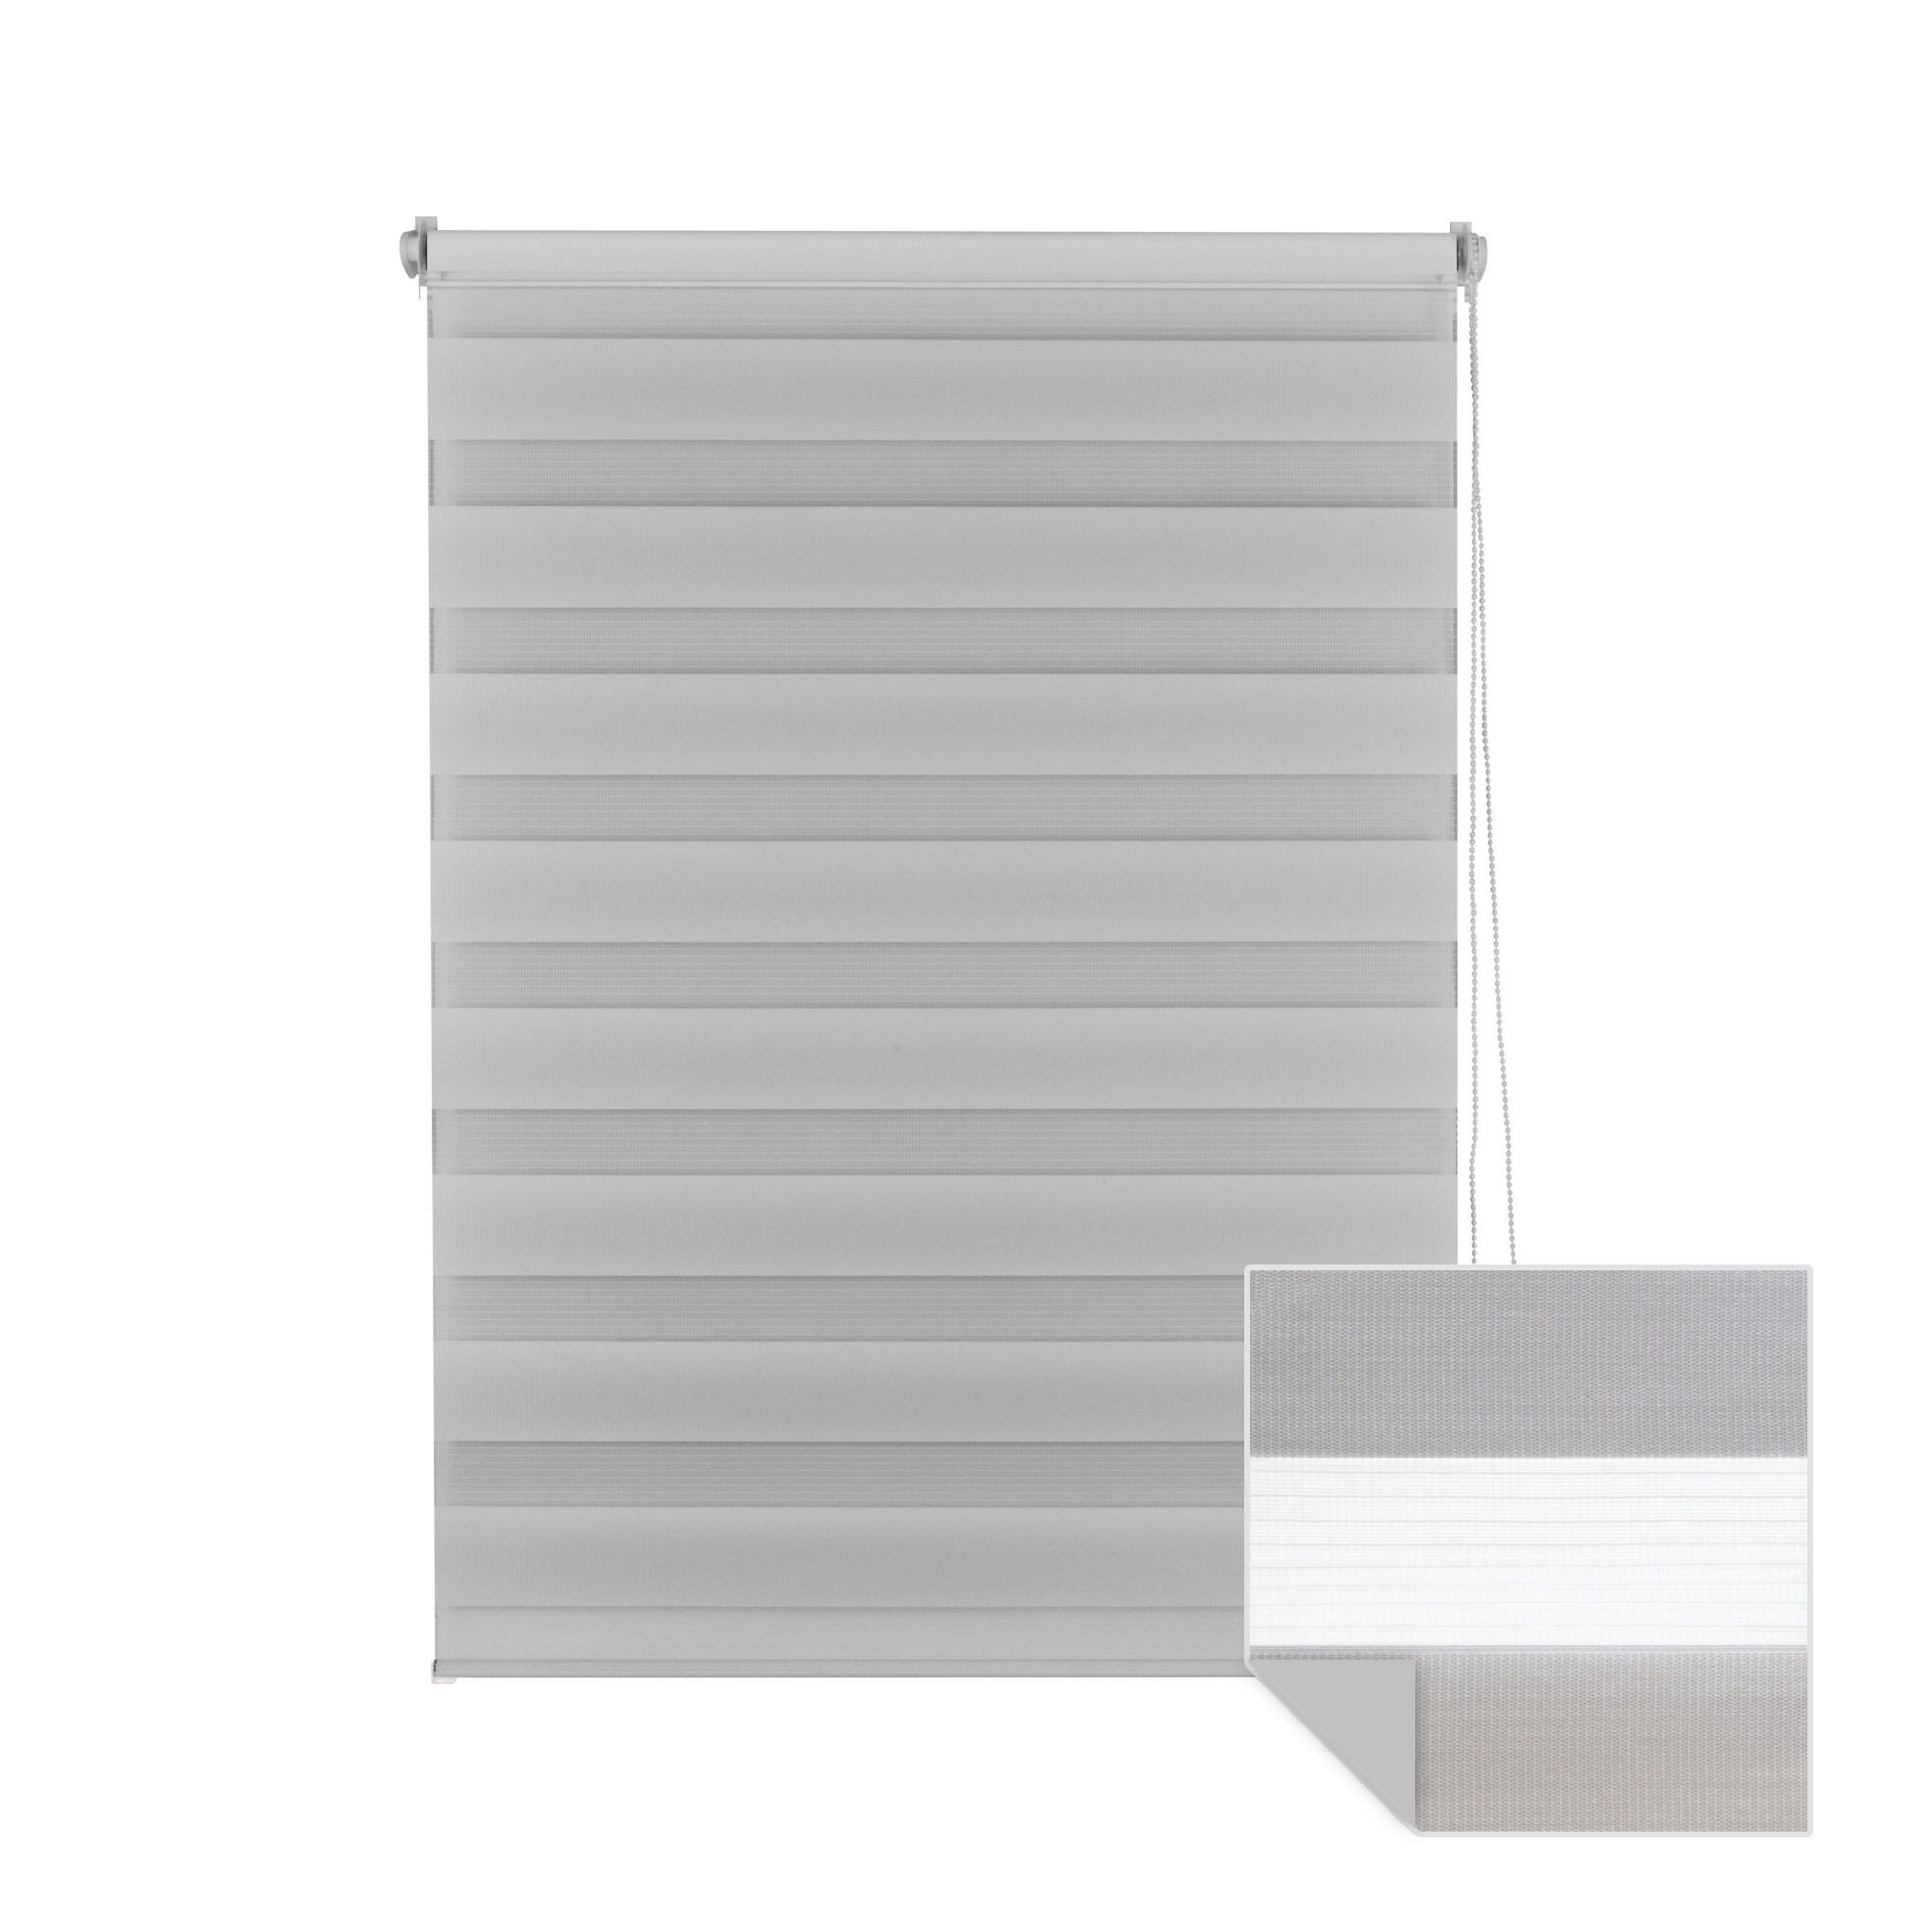 klemmfix doppelrollo duo rollo 65 x 150cm grau. Black Bedroom Furniture Sets. Home Design Ideas